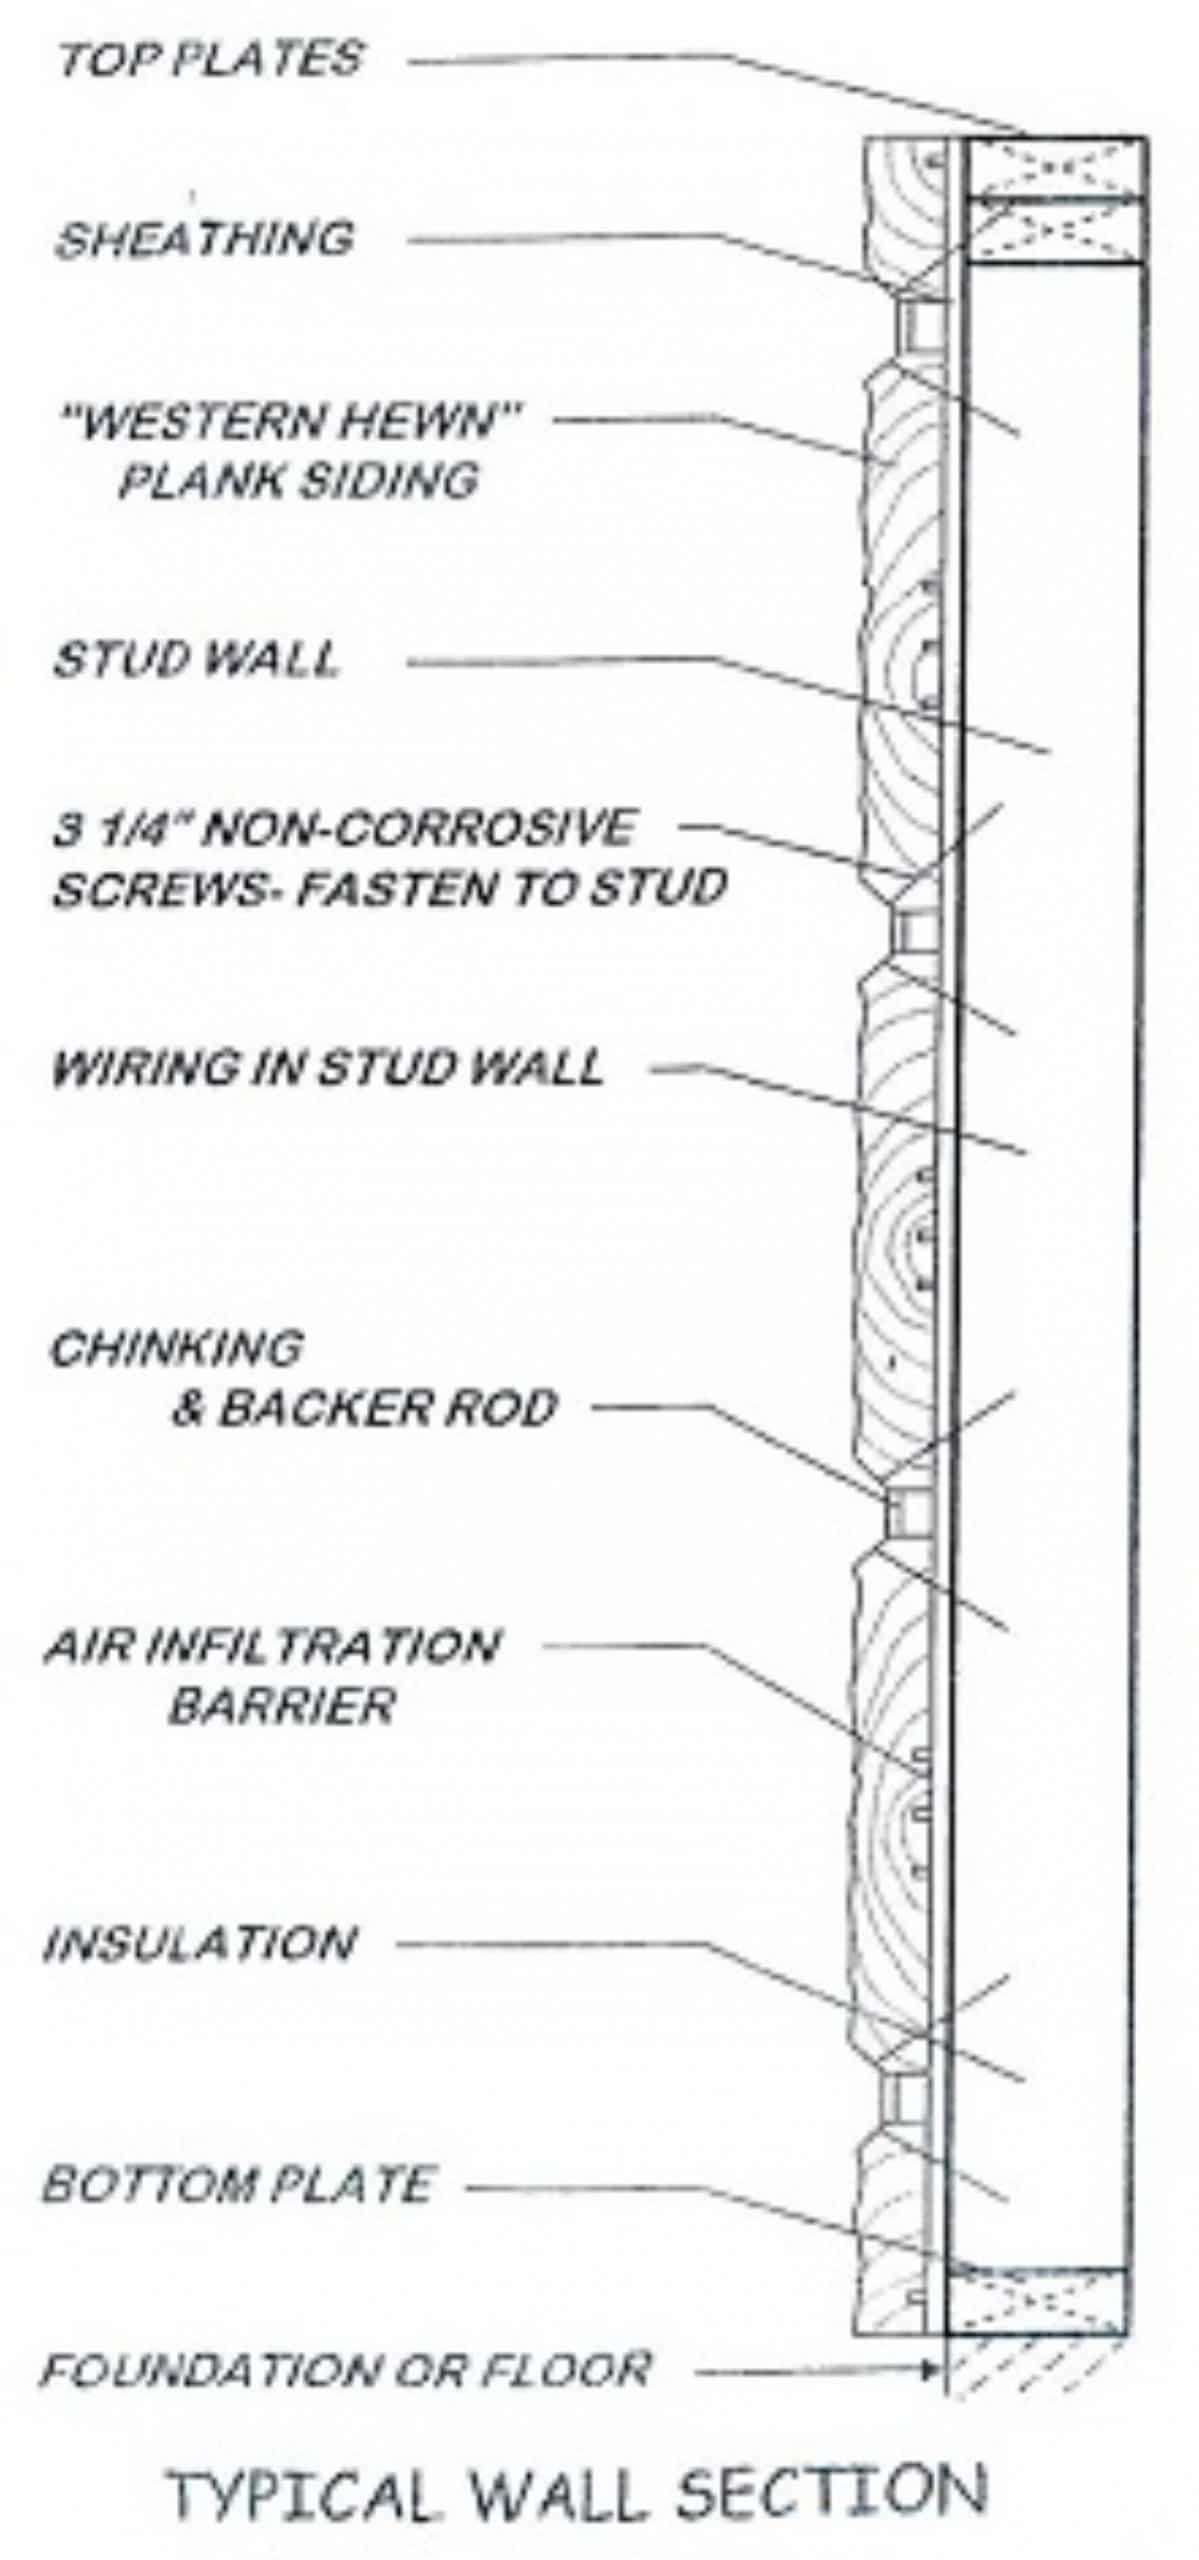 illustration of corners of wall siding